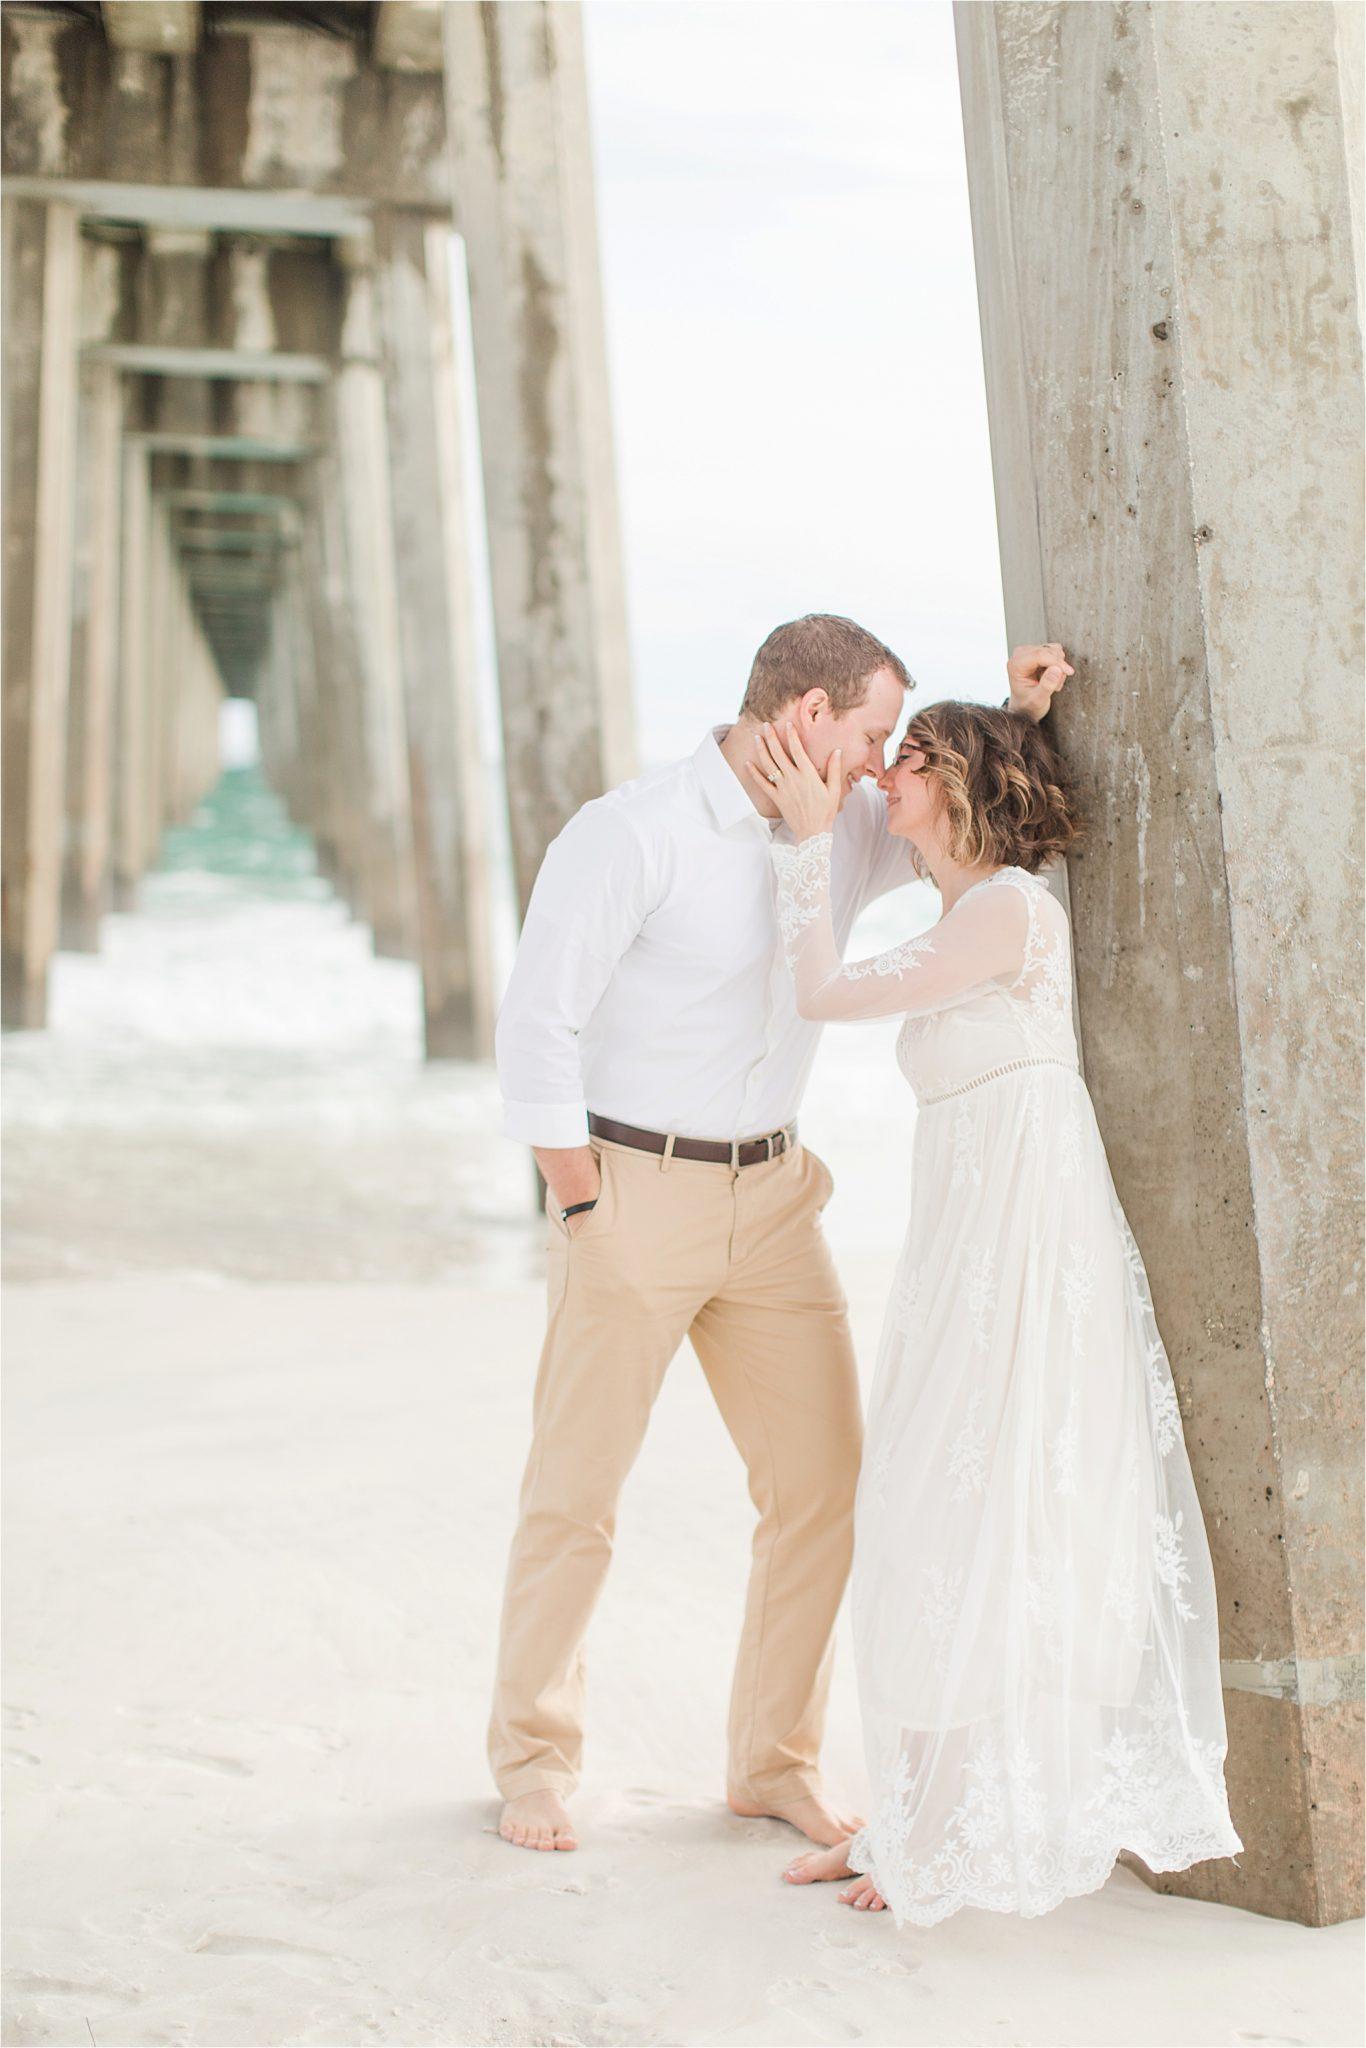 Romantic Pensacola Beach Photos at Sunset-Neil + Steph-Engagement Shoot Inspiration-Beach engagement shoot